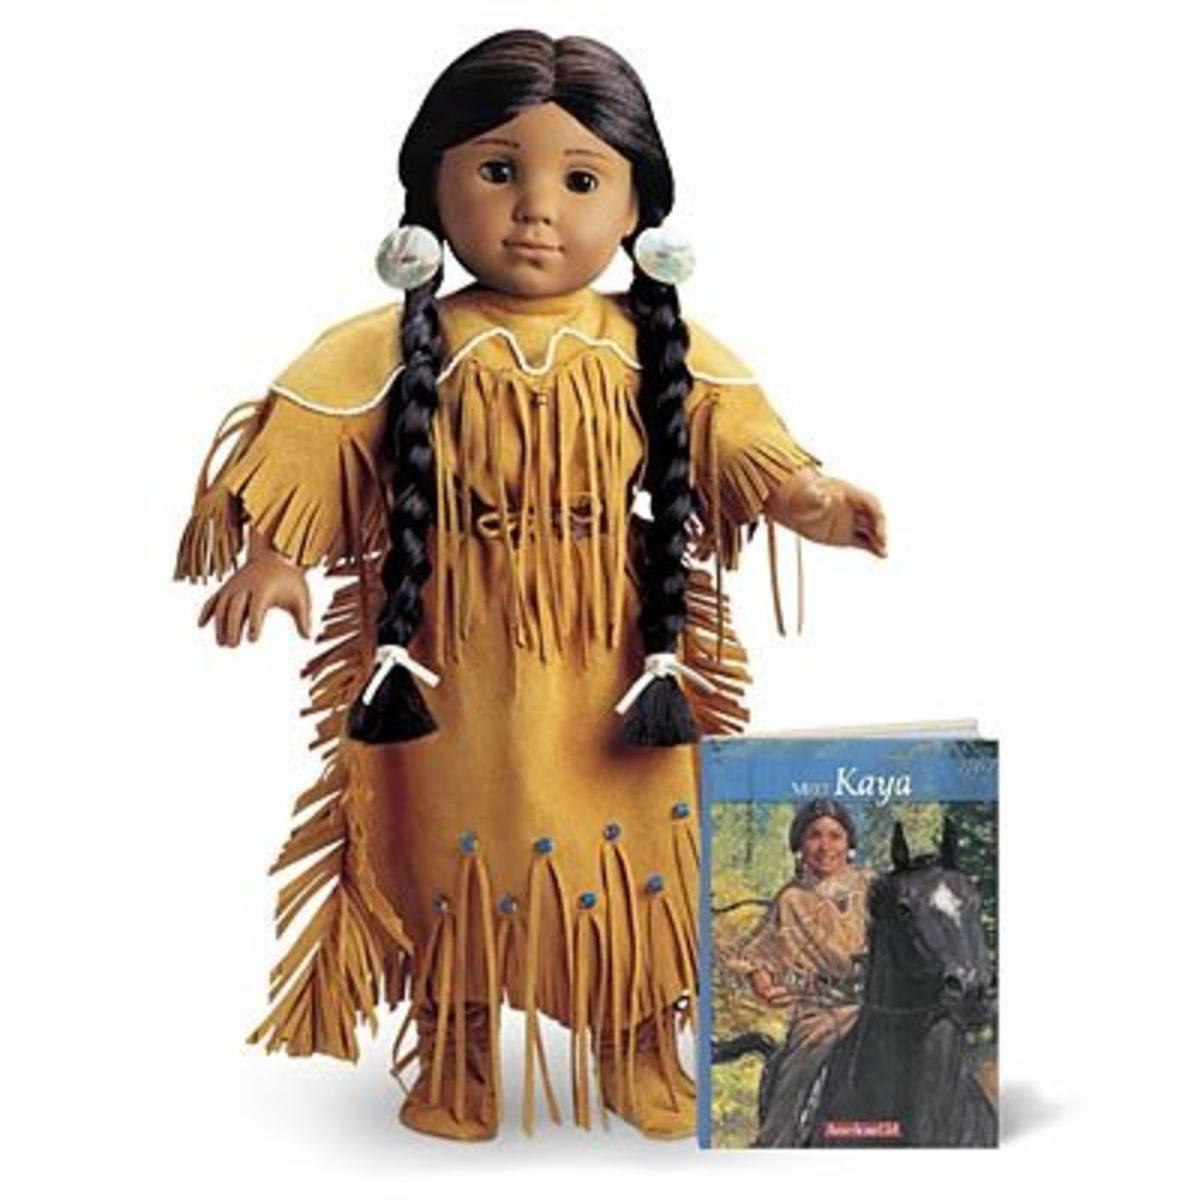 The original version of the Kaya doll, posed with the Meet Kaya book